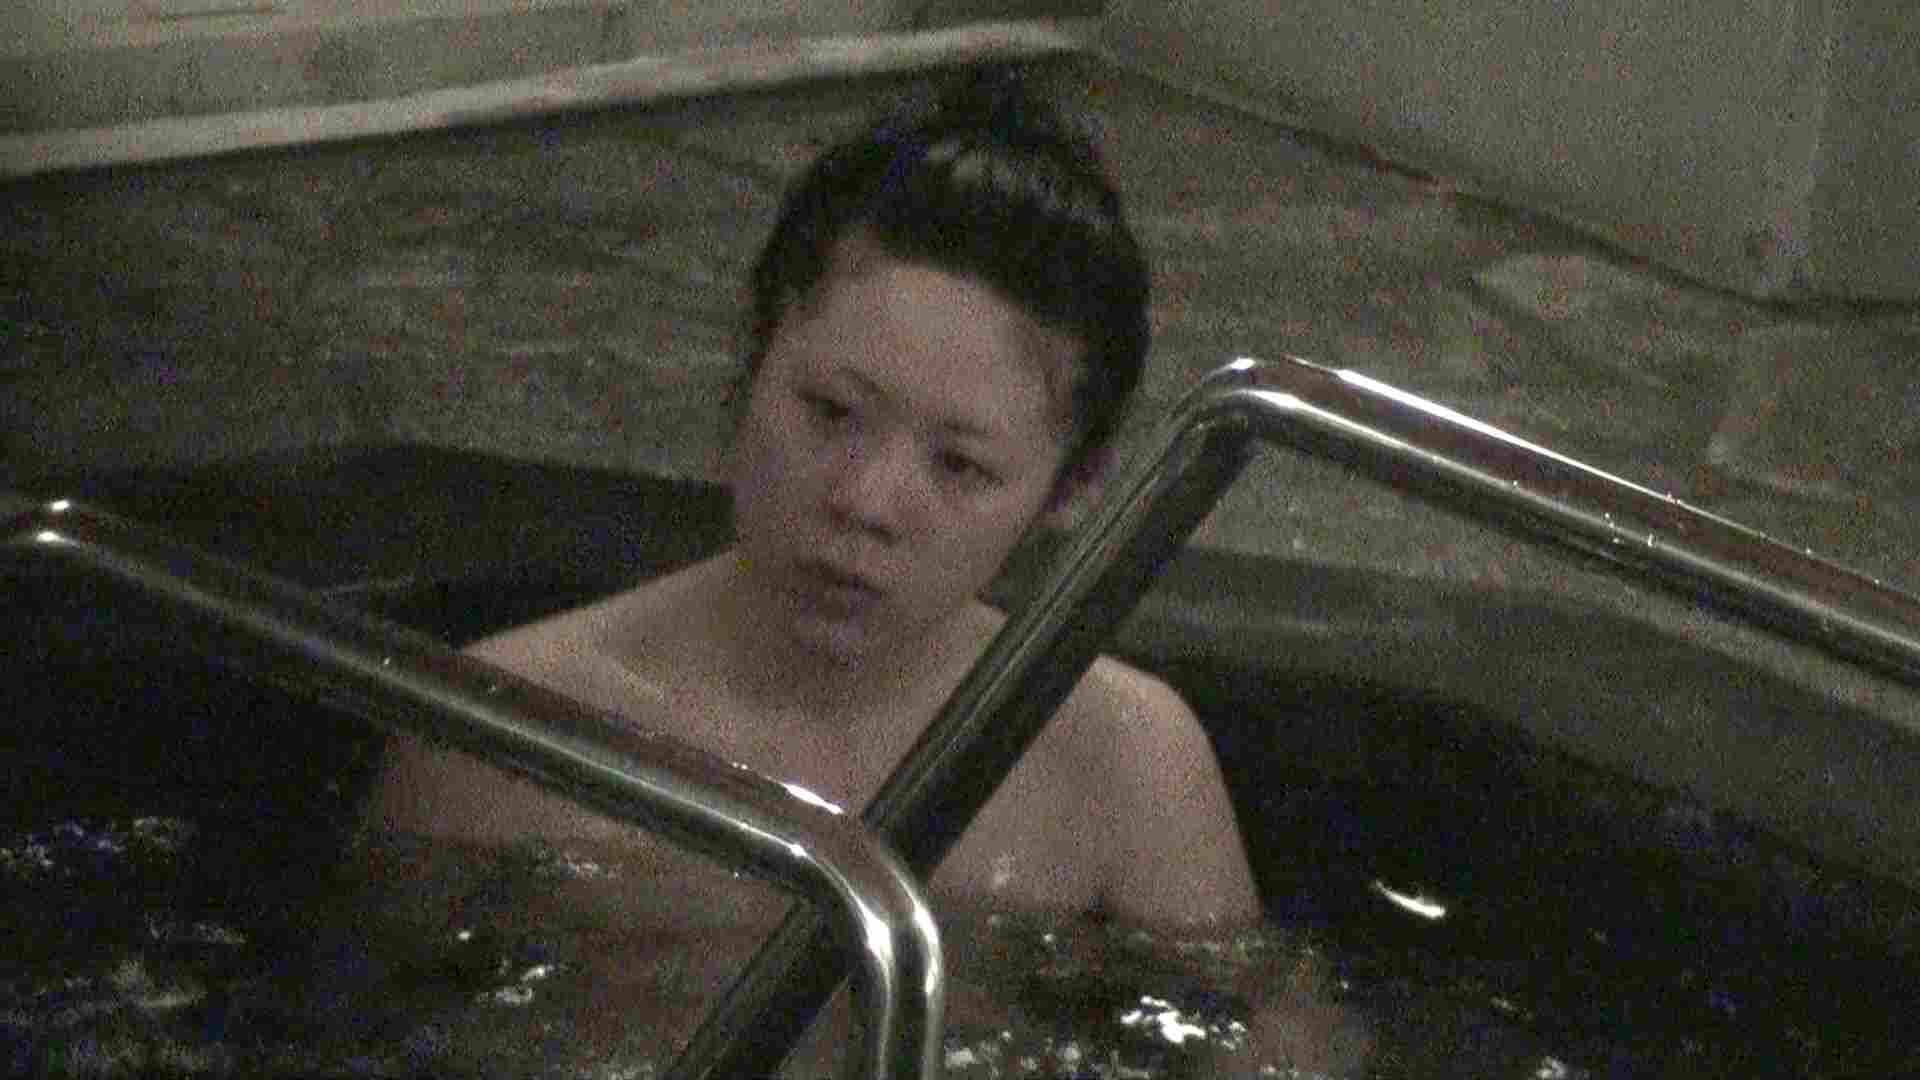 Aquaな露天風呂Vol.314 盗撮師作品 | 露天風呂突入  86pic 55